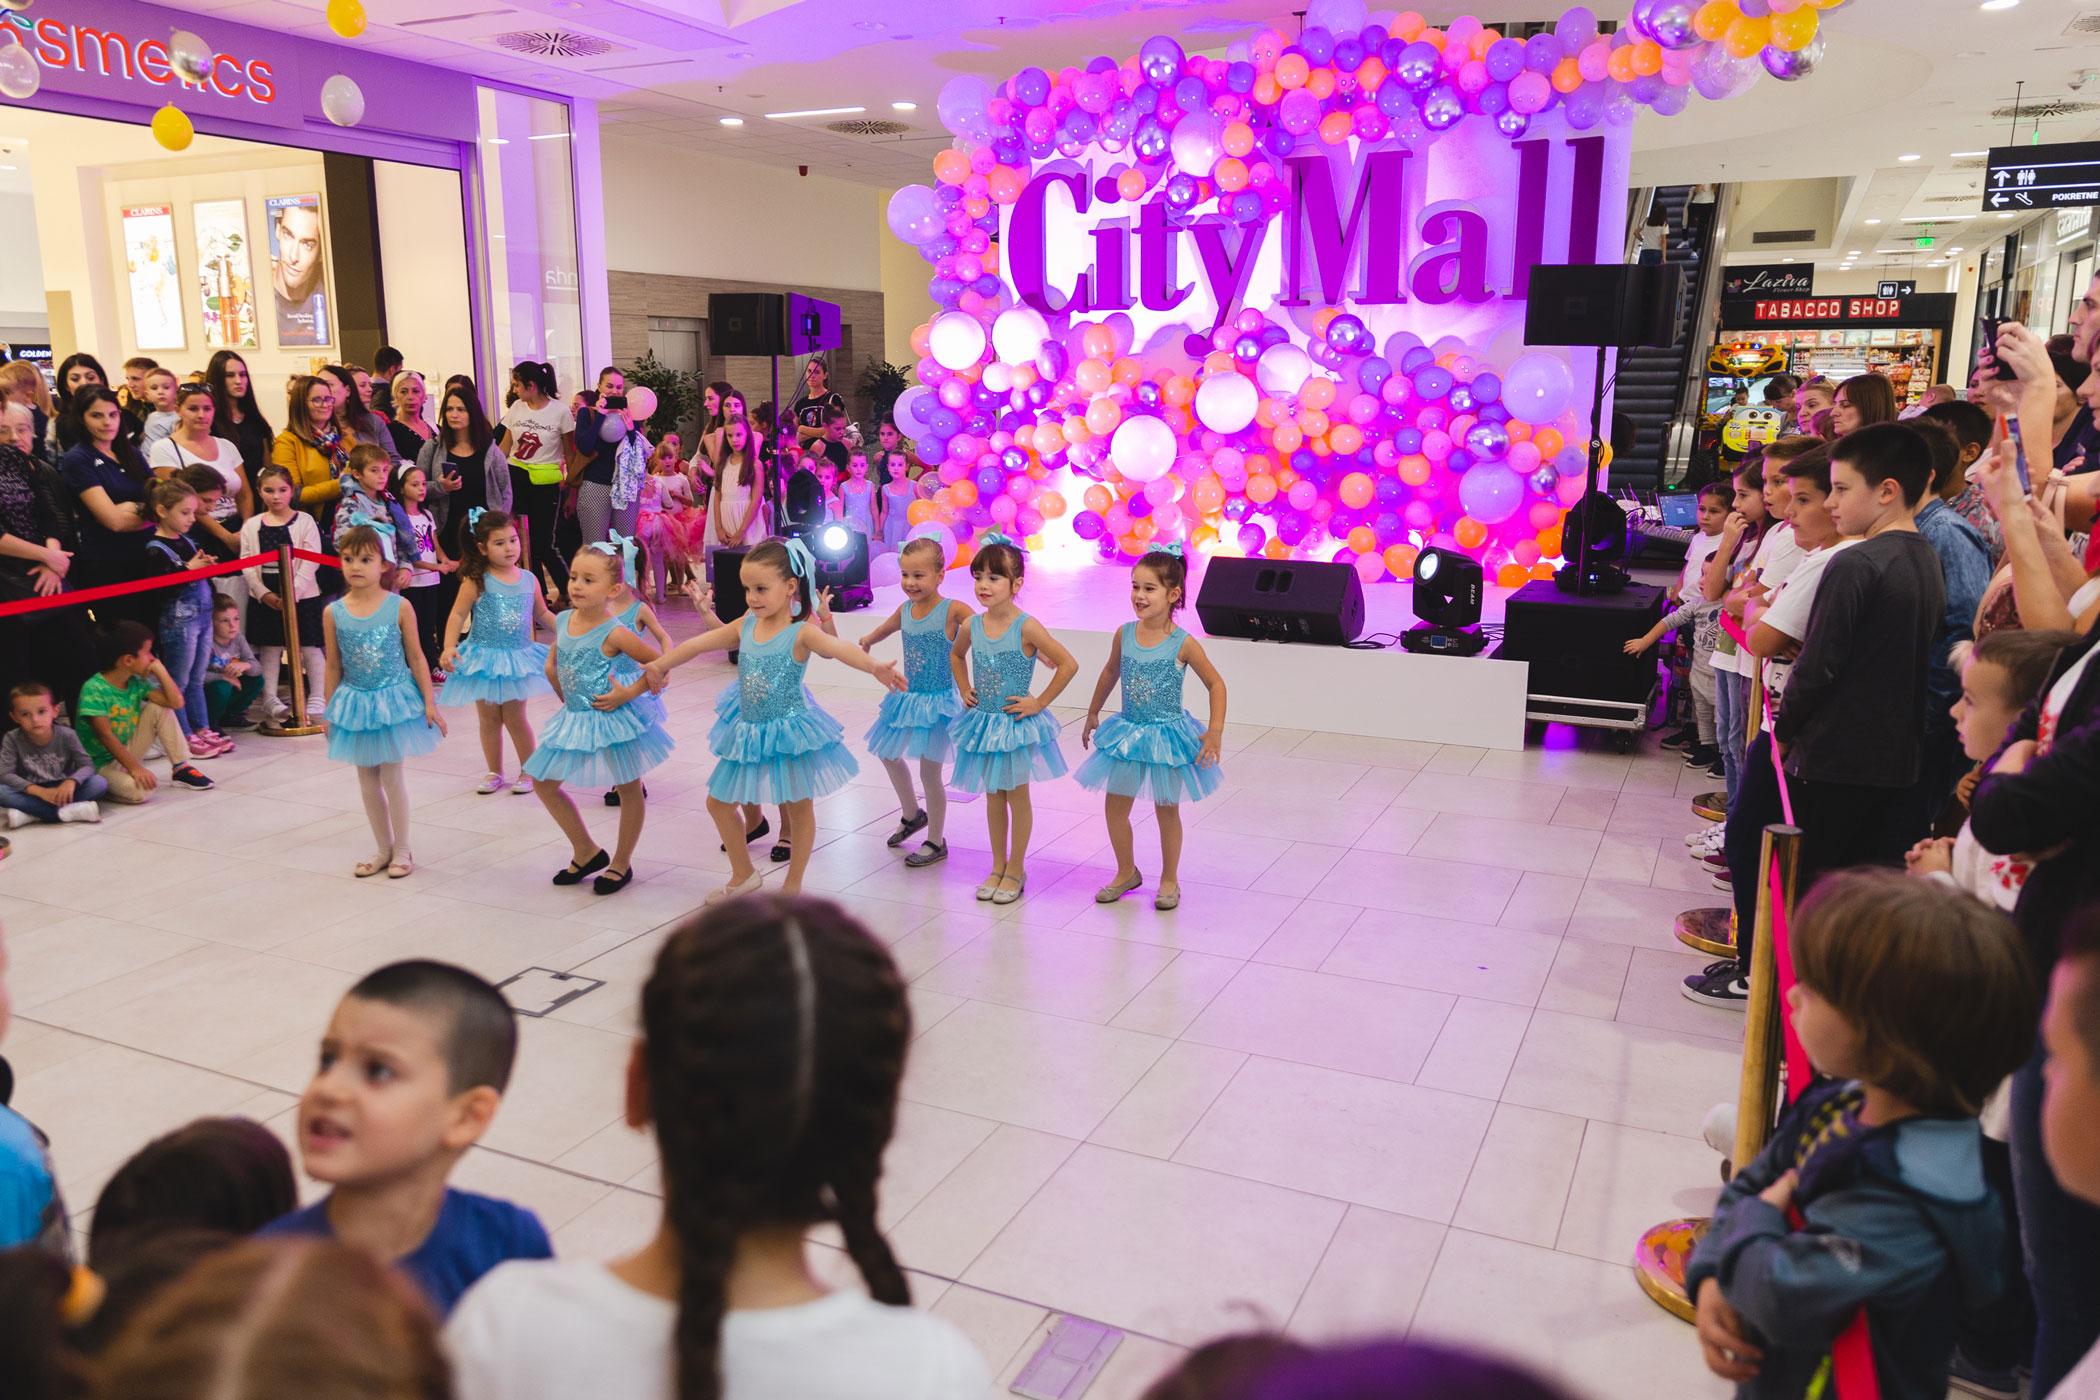 City Mall celebrates its third birthday